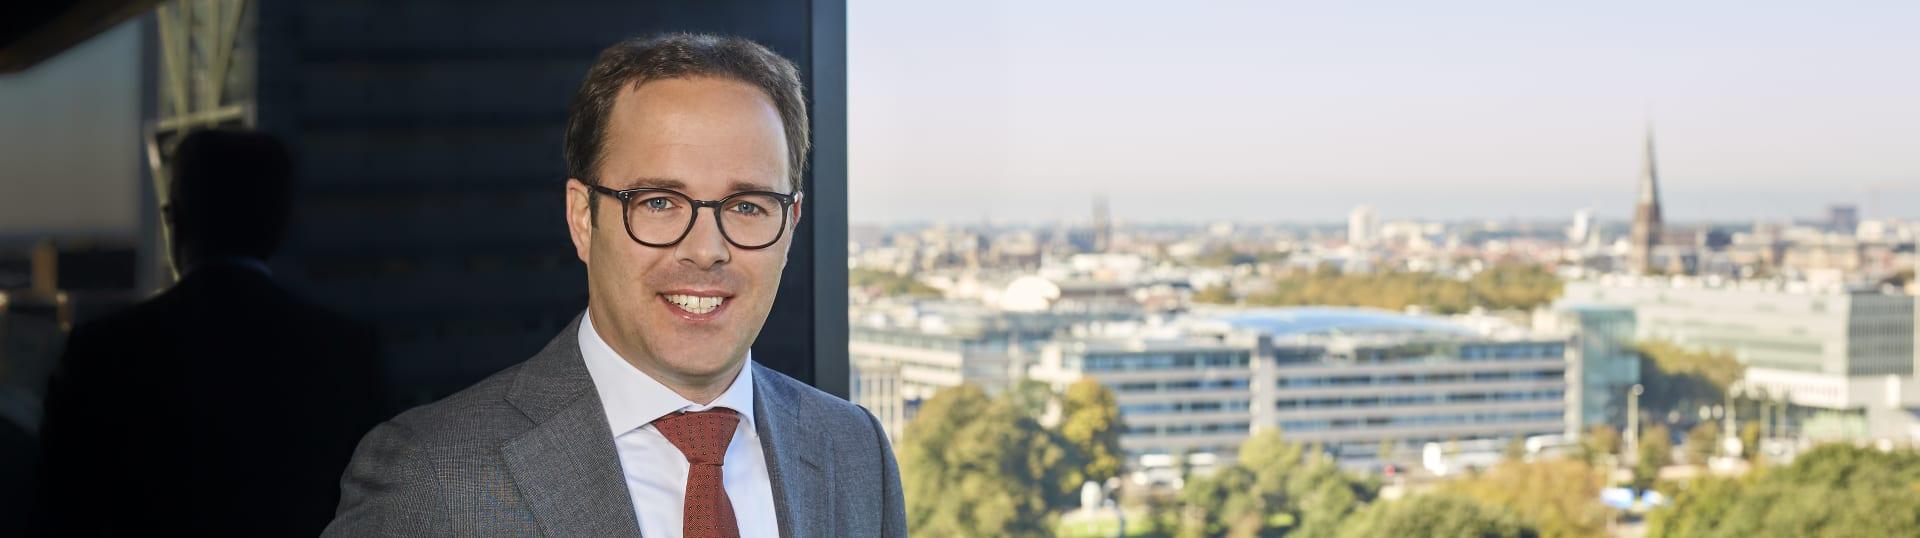 Arno Geleijnse, advocaat Pels Rijcken